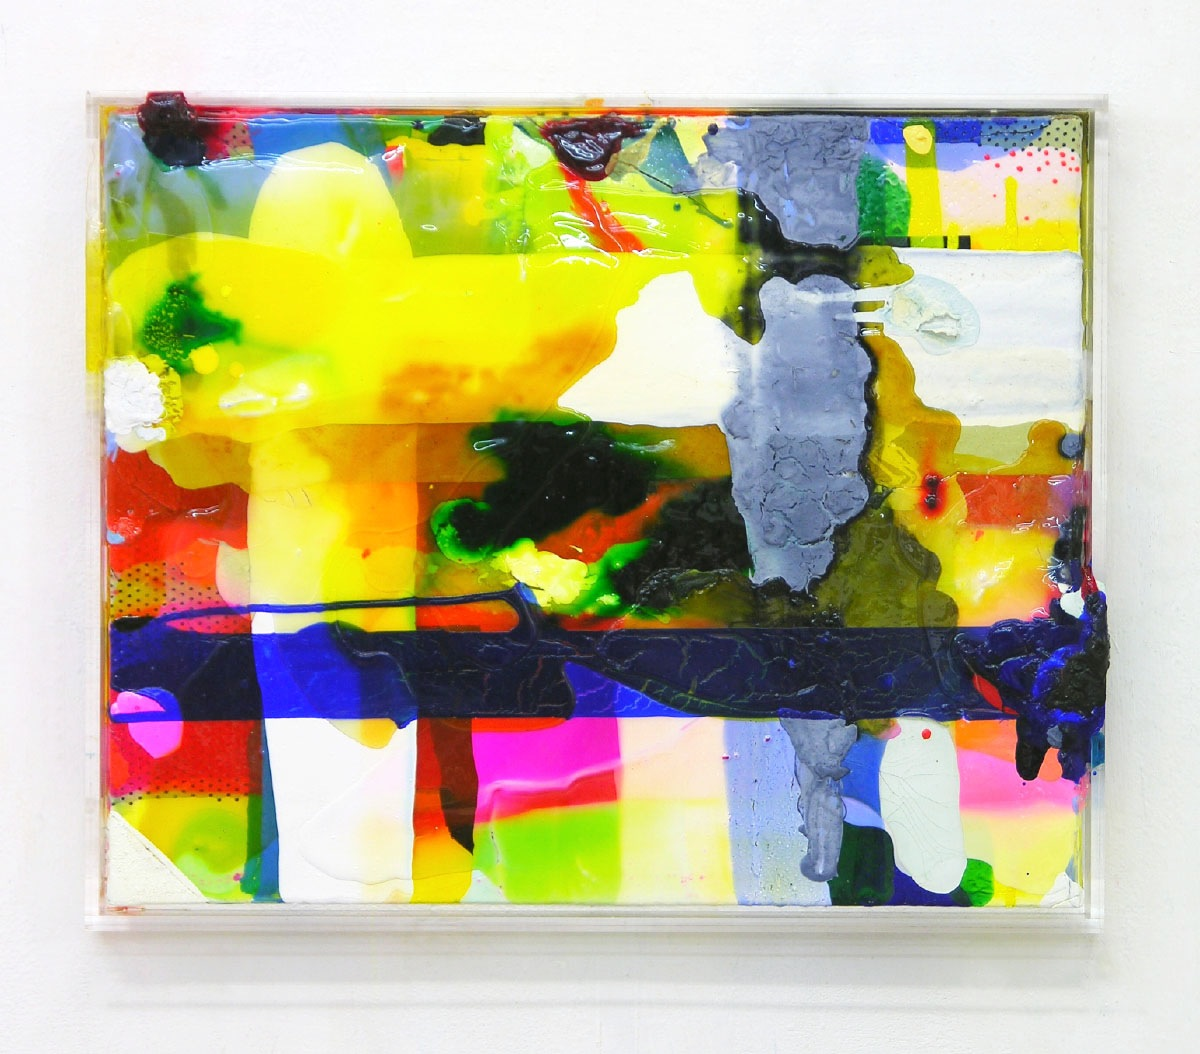 """Element"", 63x52x7 cm, 2007, Plexi ,Acryl, LW"